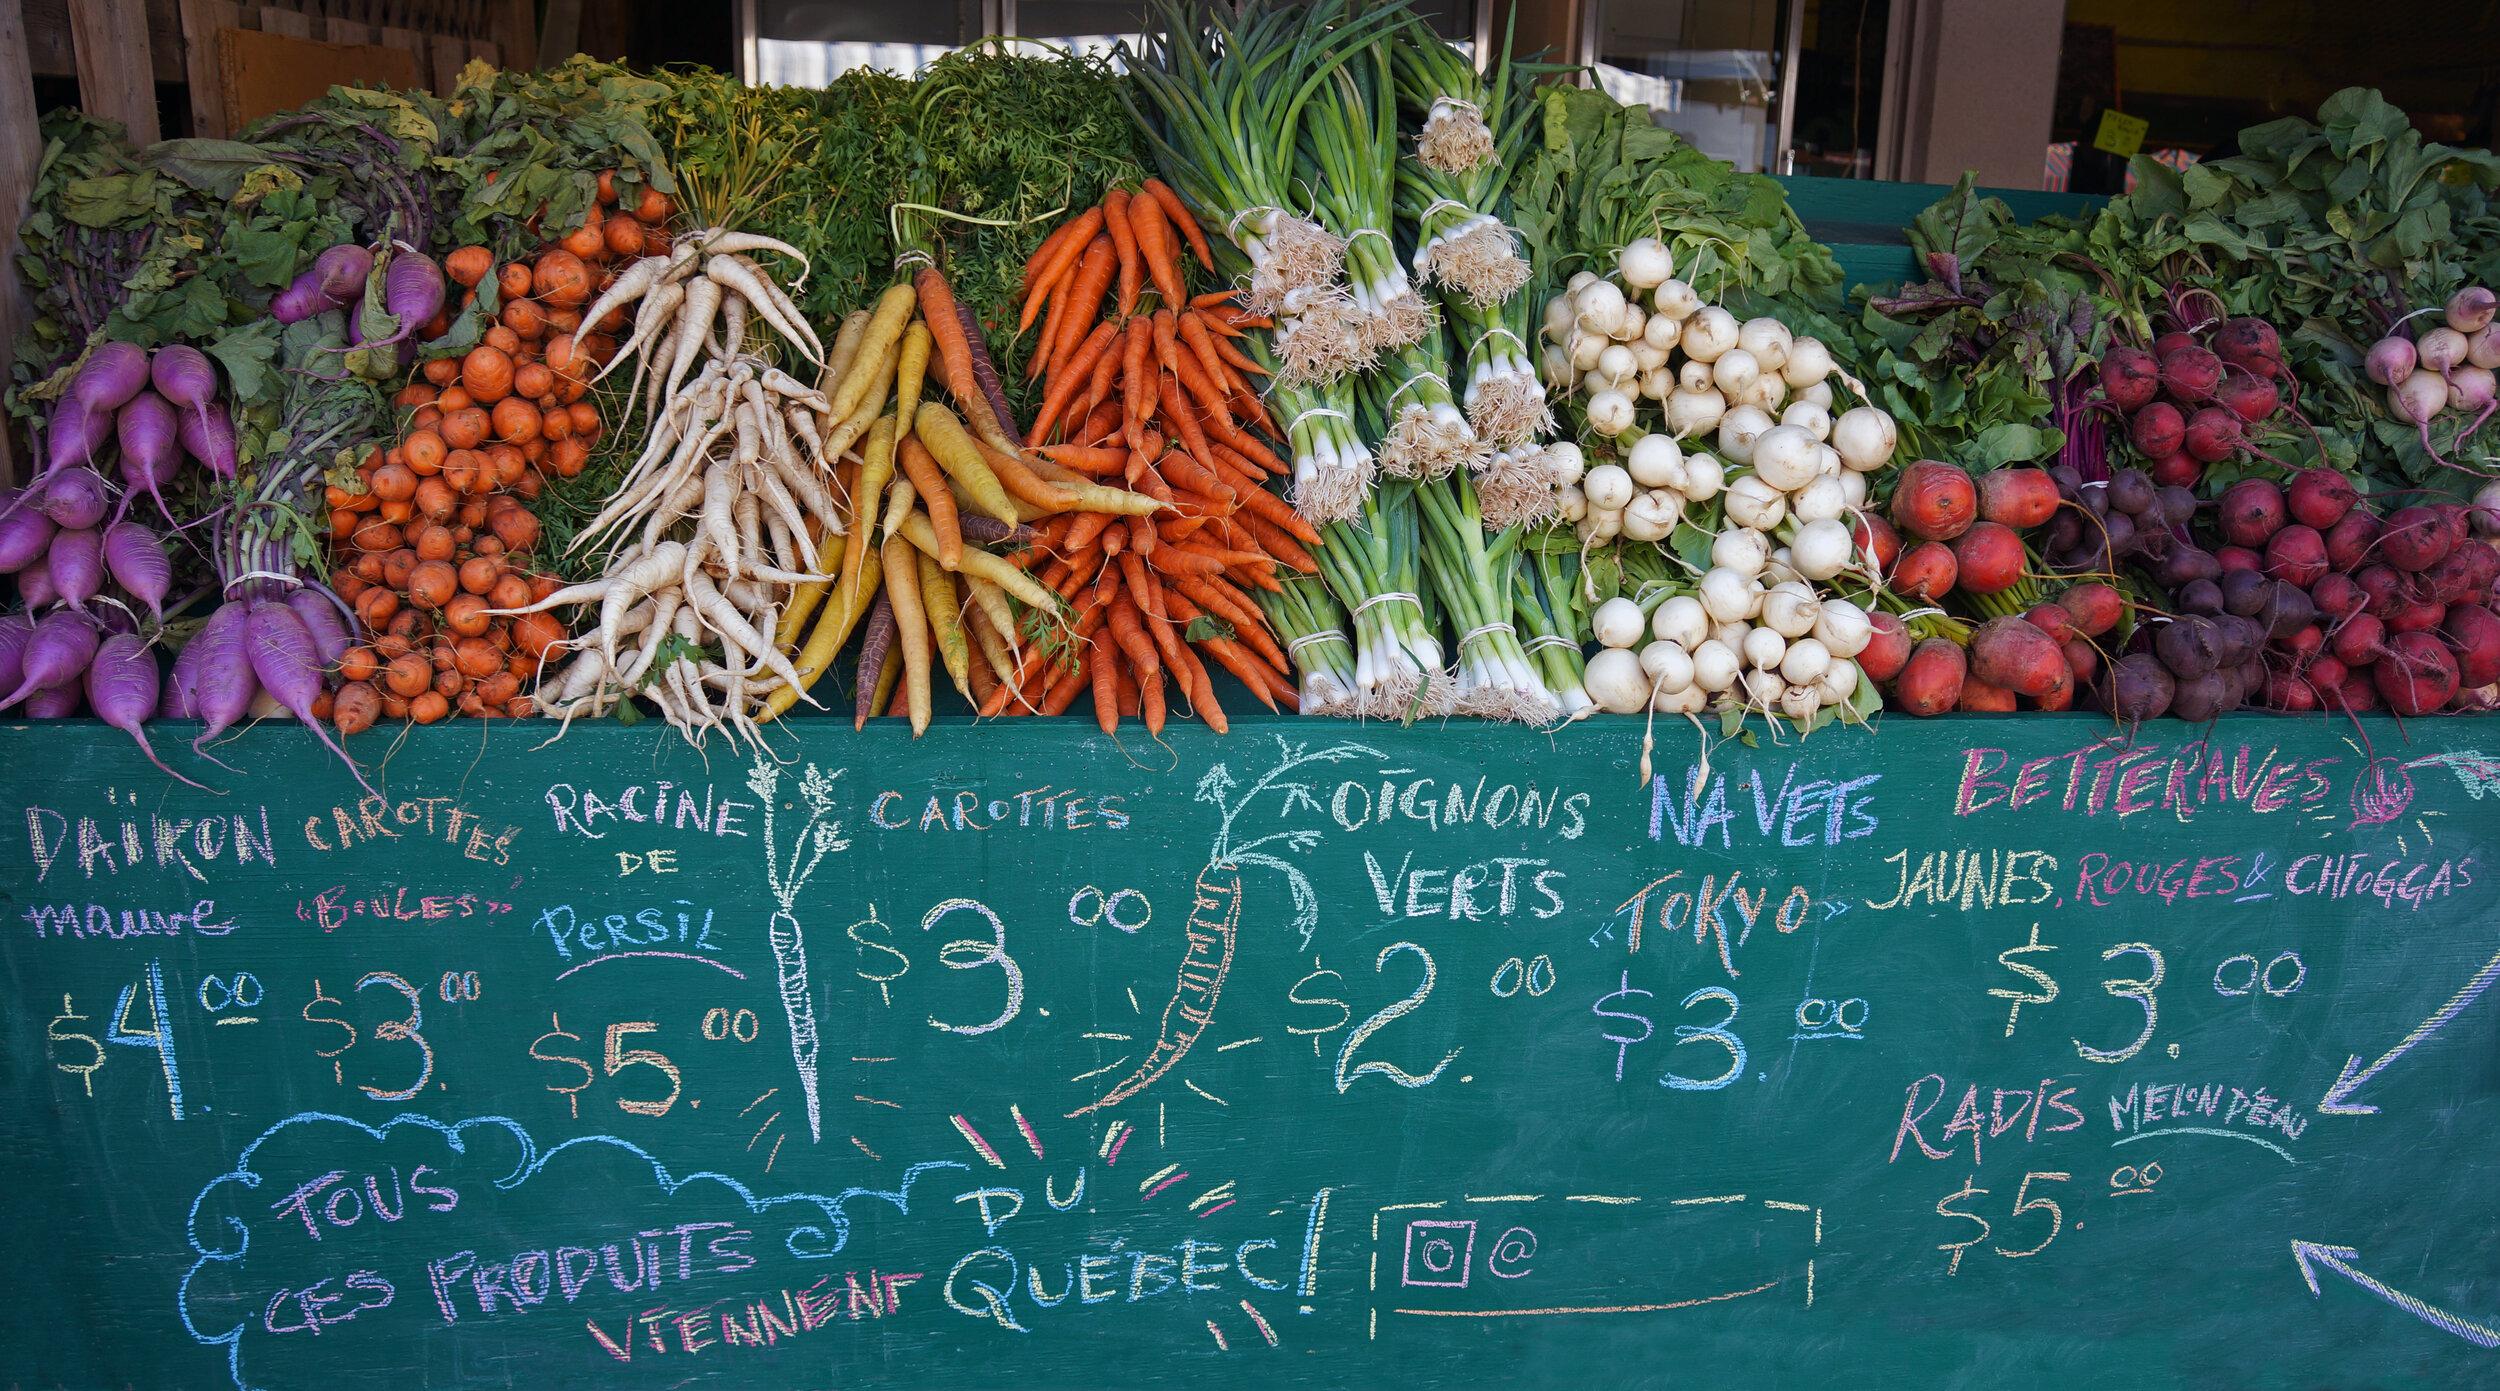 French Farmers' Market